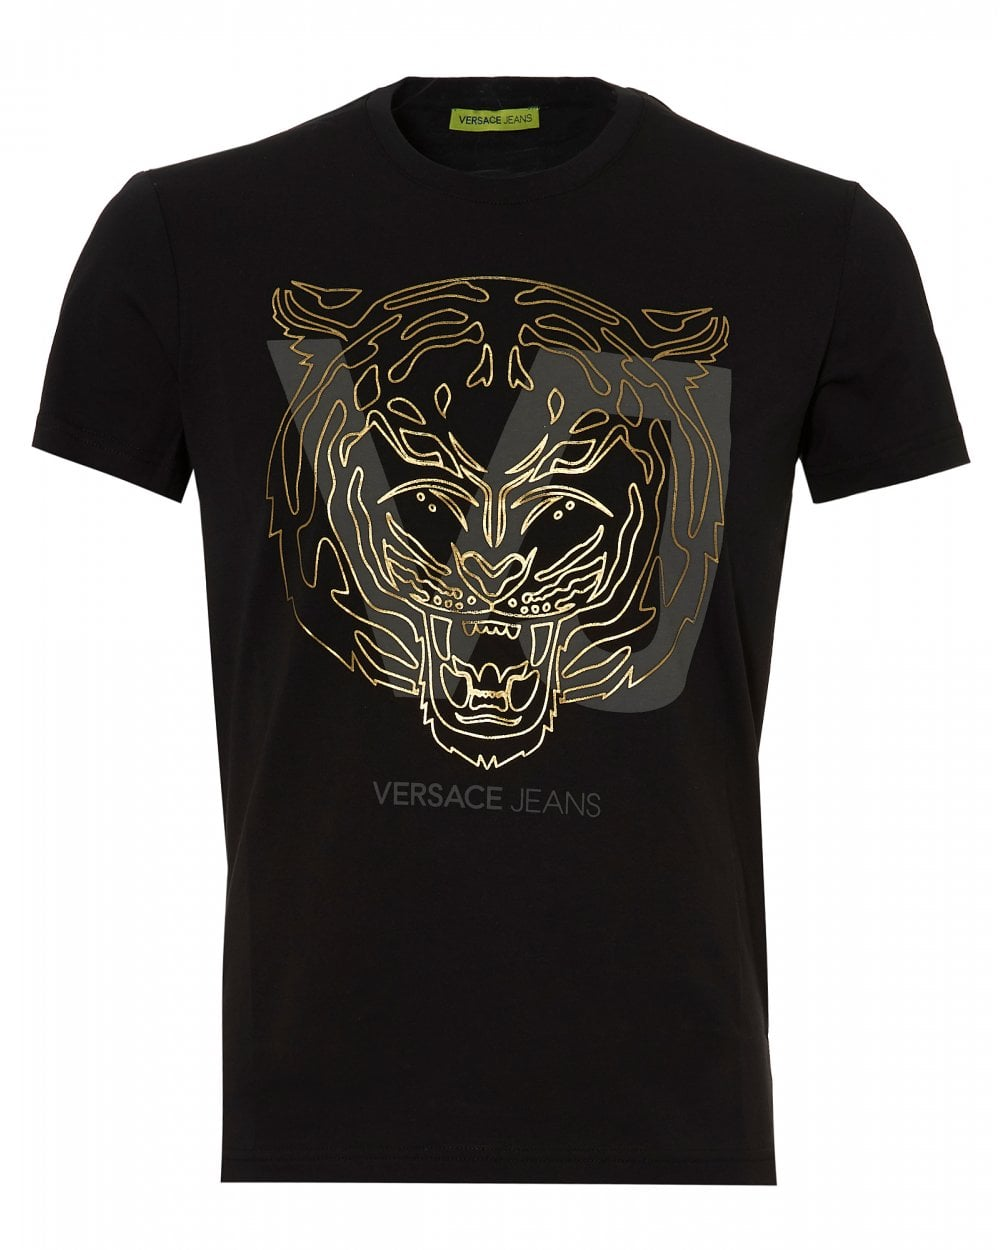 008608a6e19 Versace Jeans Mens Gold Tiger Logo T-Shirt